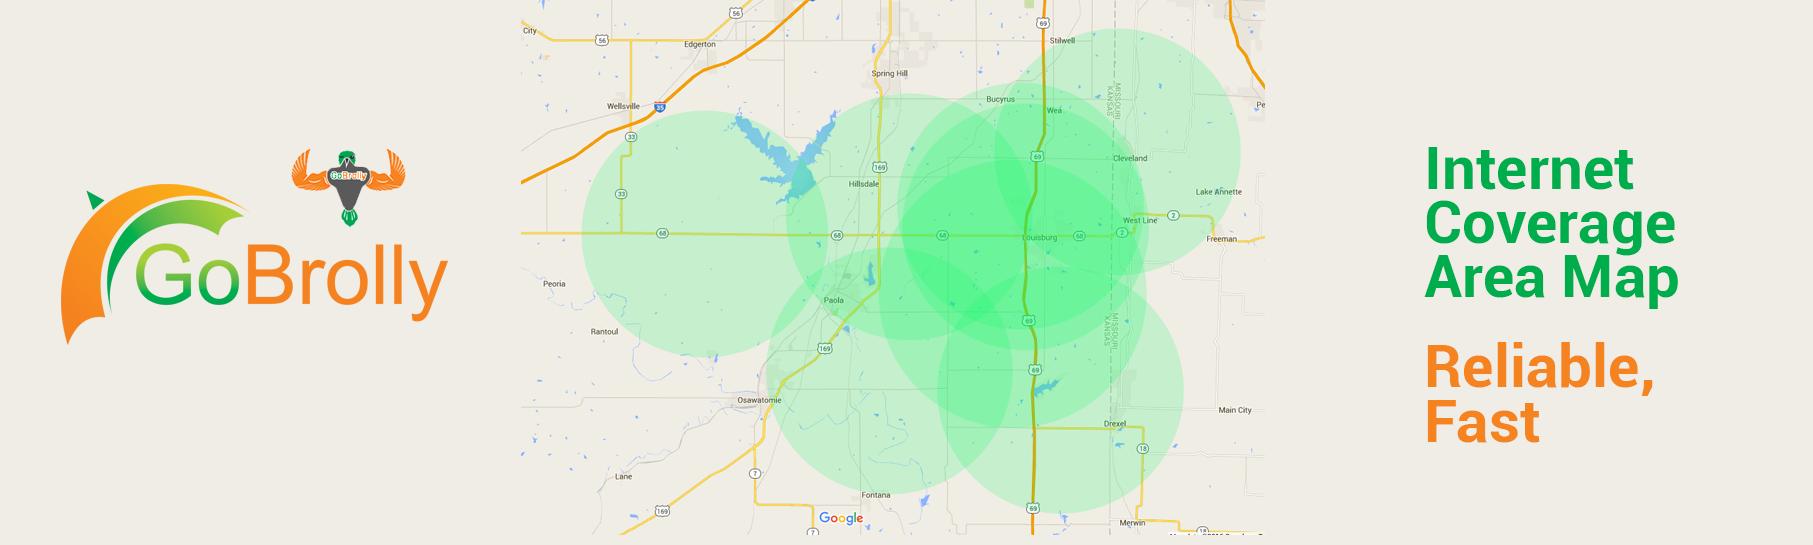 GoBrolly® Wireless Internet Service Area Map 2017